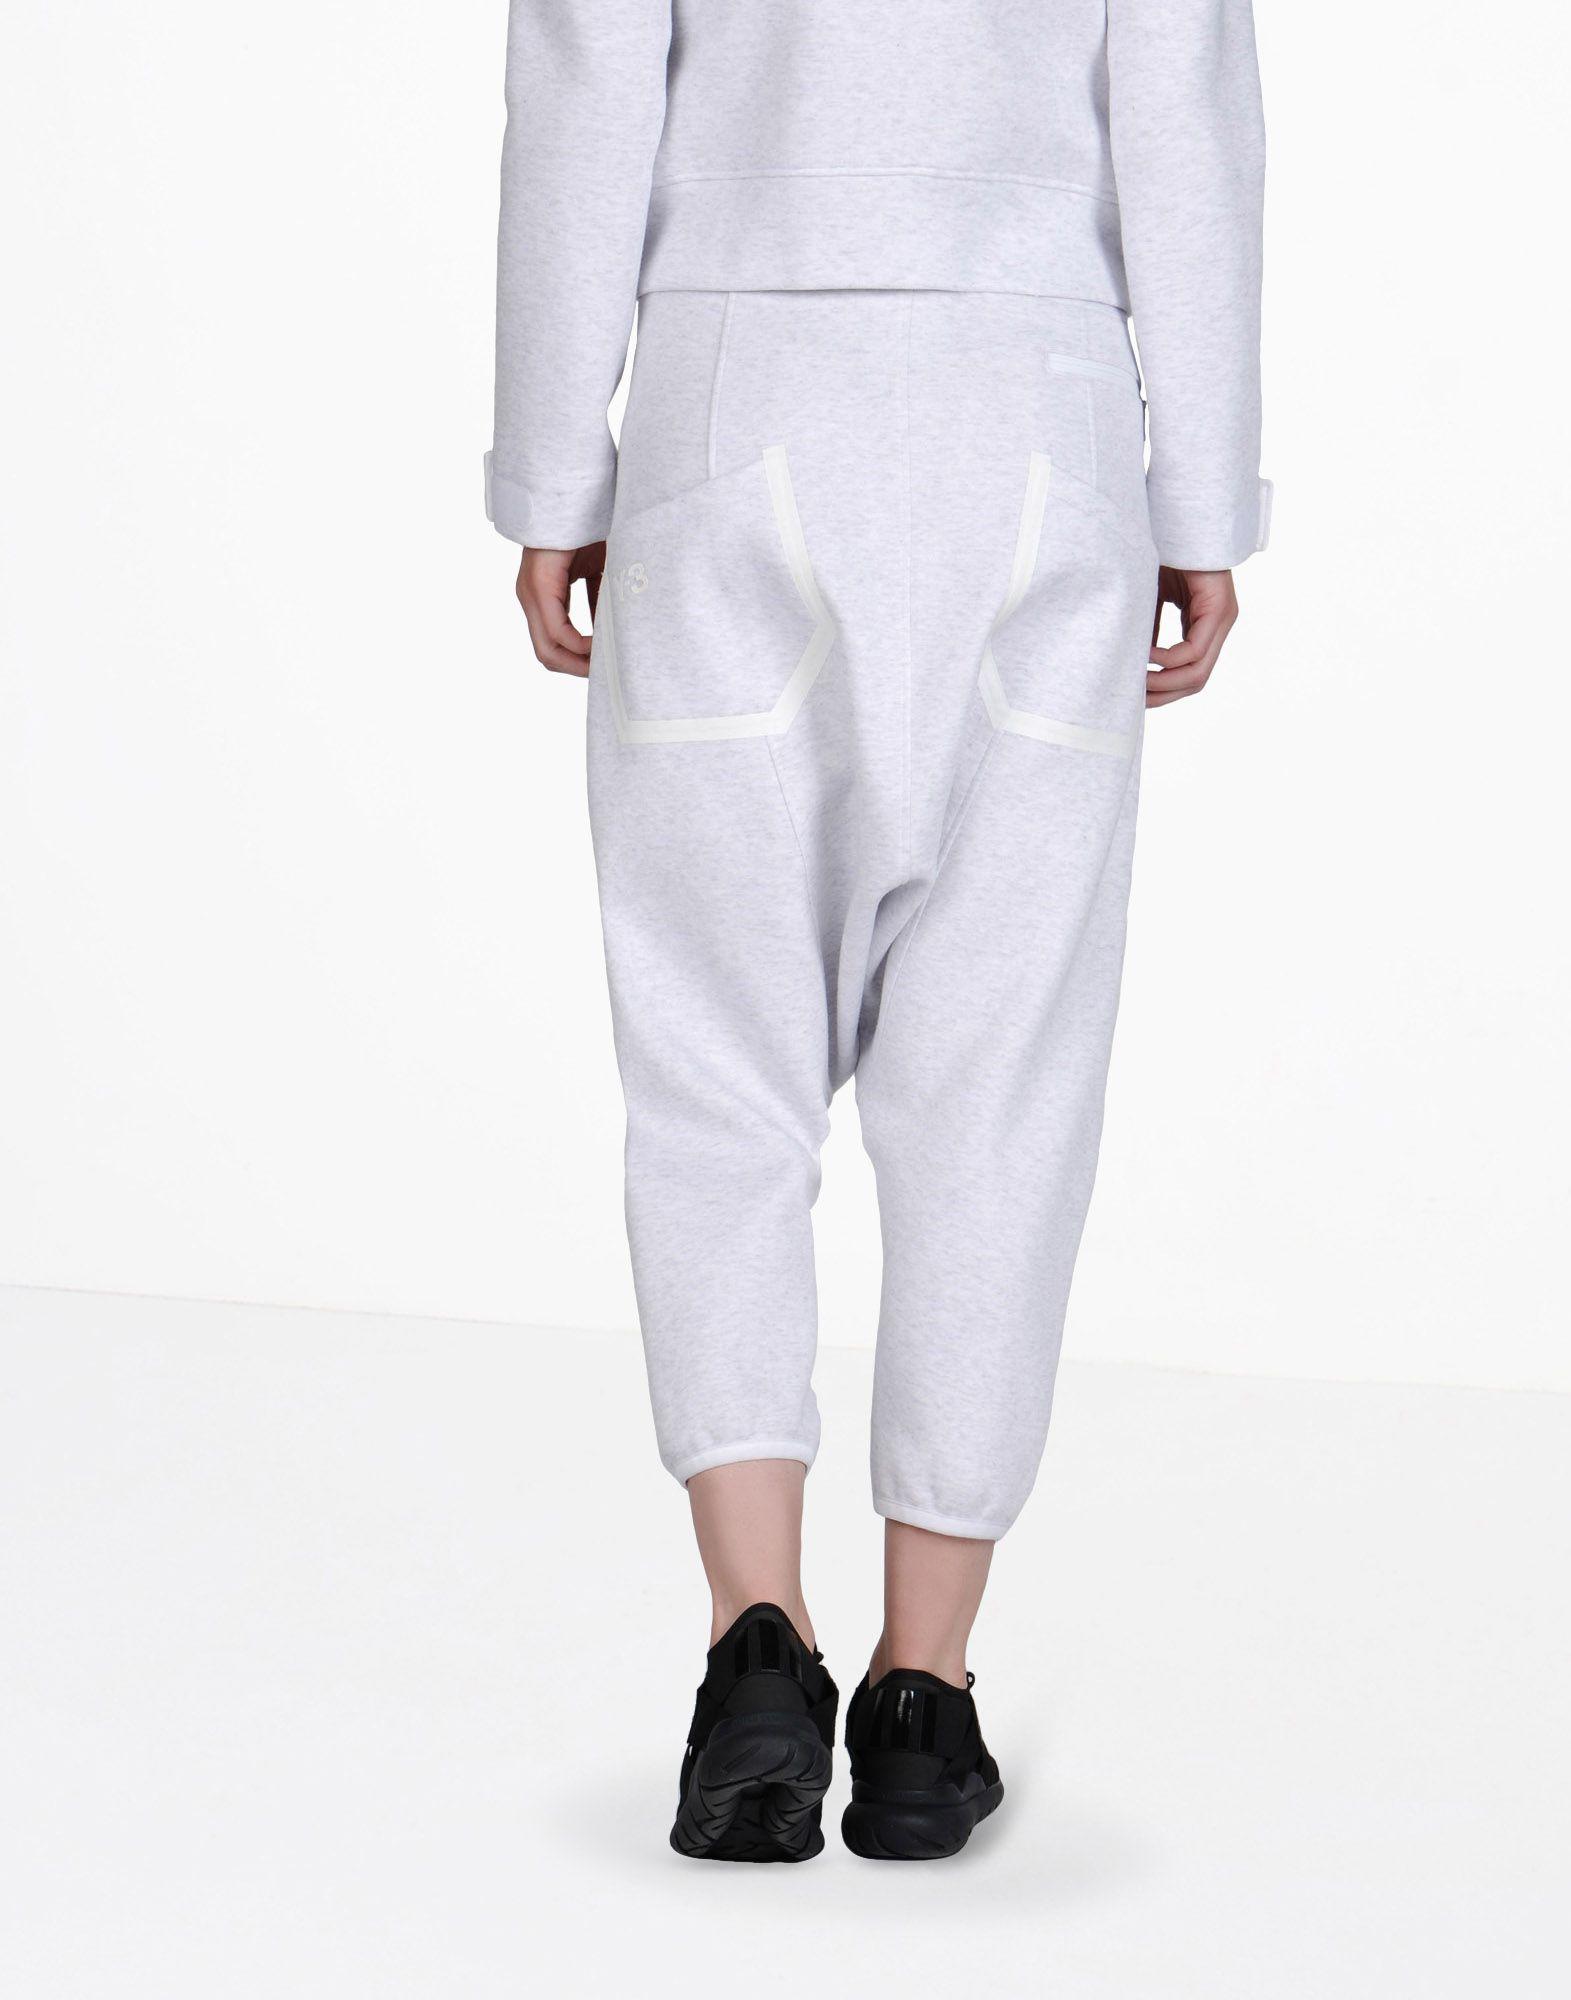 Y-3 FUTURE SPORT PANT PANTS woman Y-3 adidas